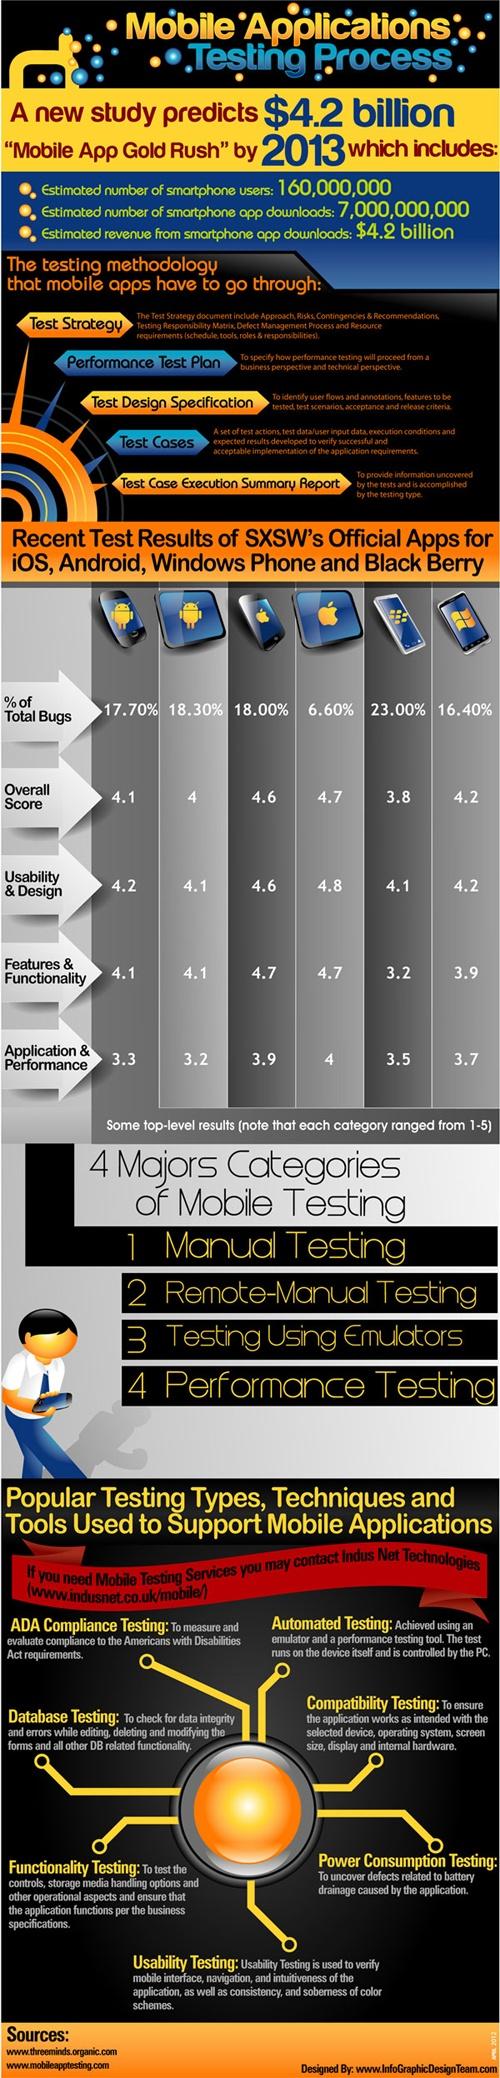 Mobile App Testing ----BTW, Please Visit: http://artcaffeine.imobileappsys.com